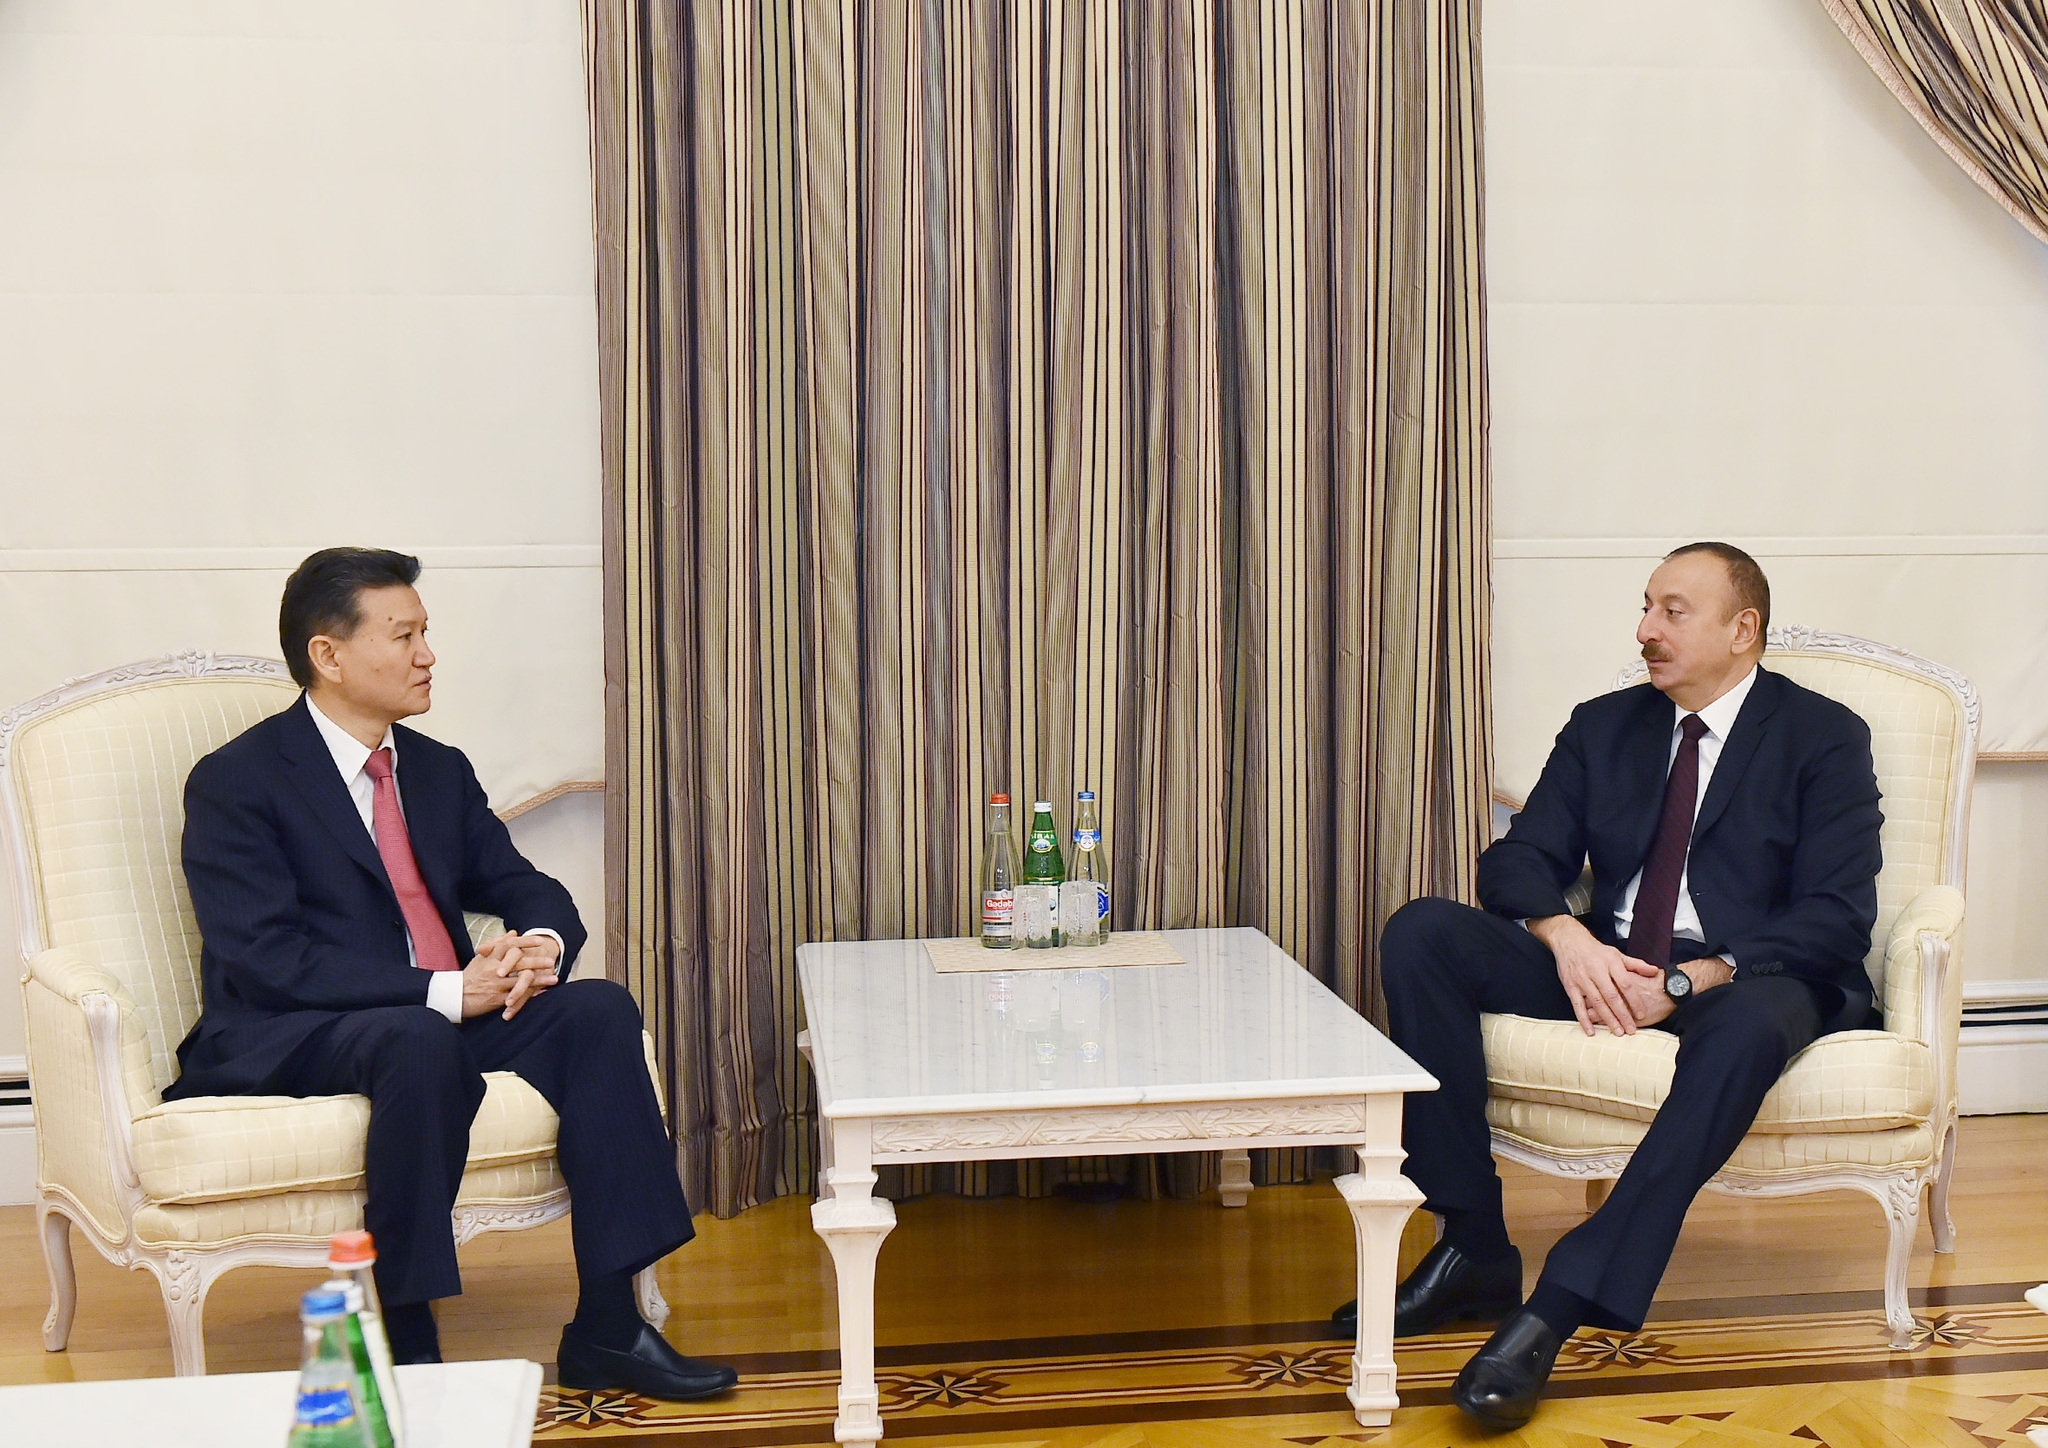 Президент Азербайджана Ильхам Алиев принял президента Международной шахматной федерации